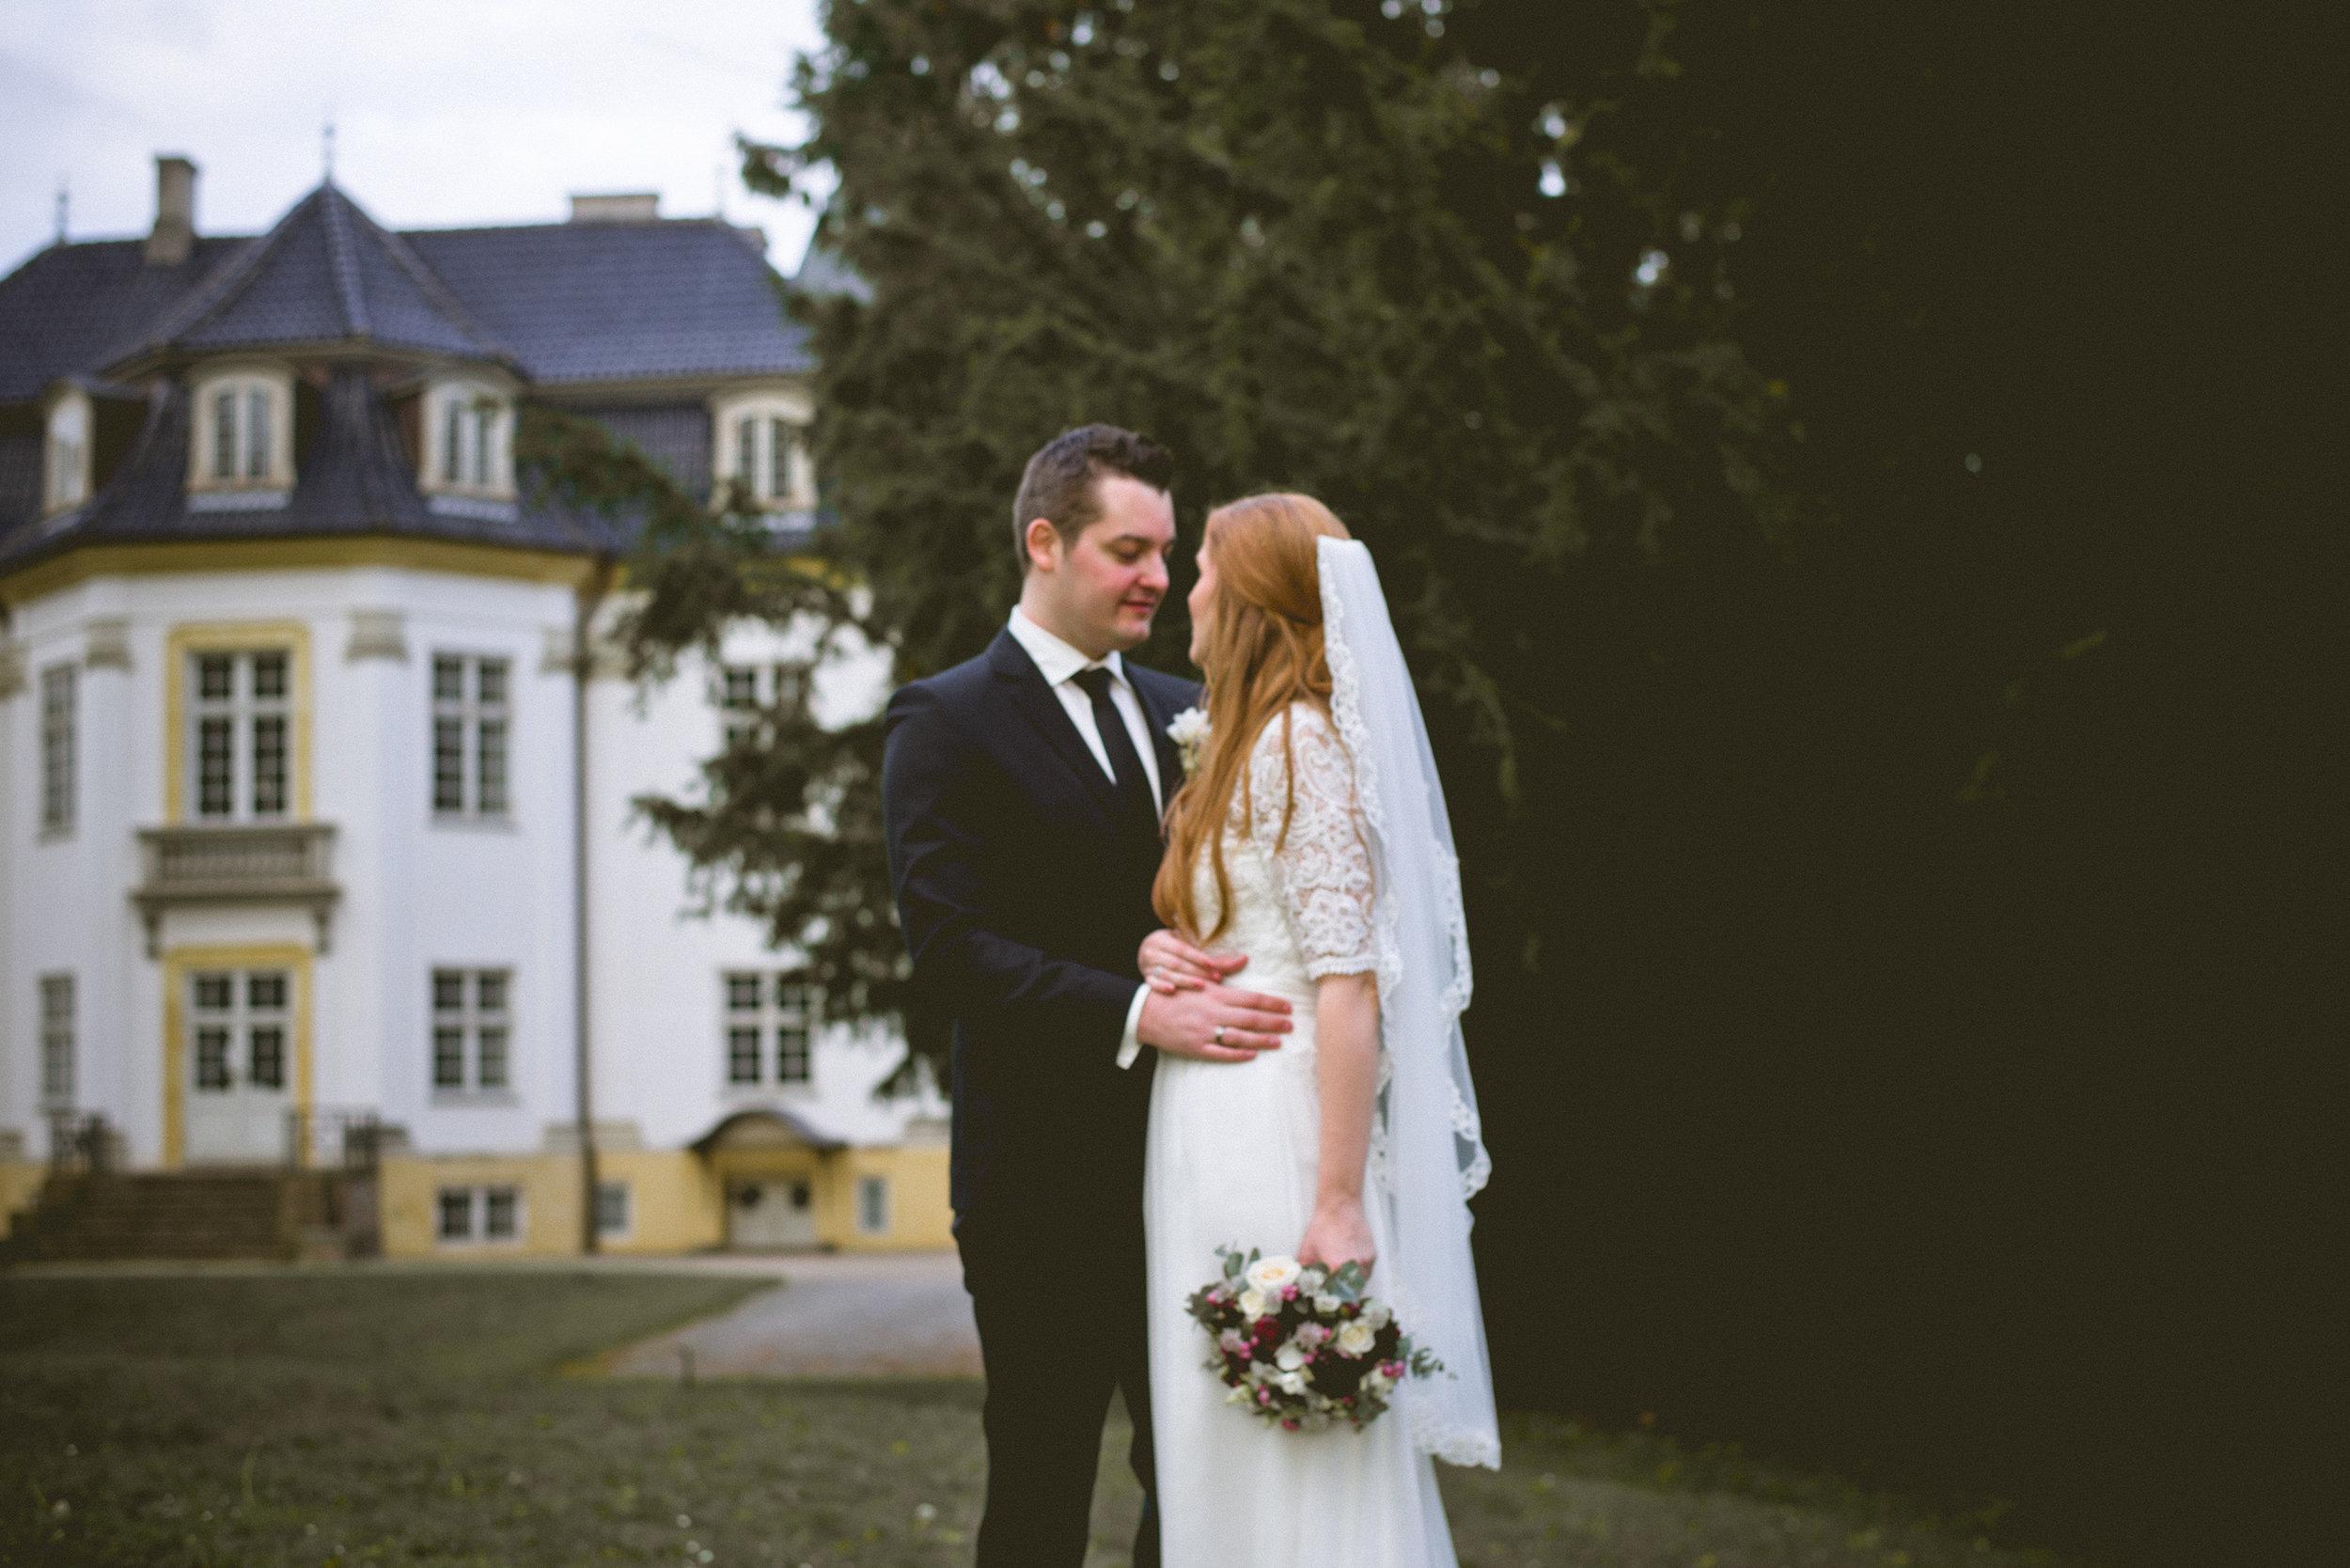 York Region Ontario Wedding Photographer - Bride + Groom-23.jpg